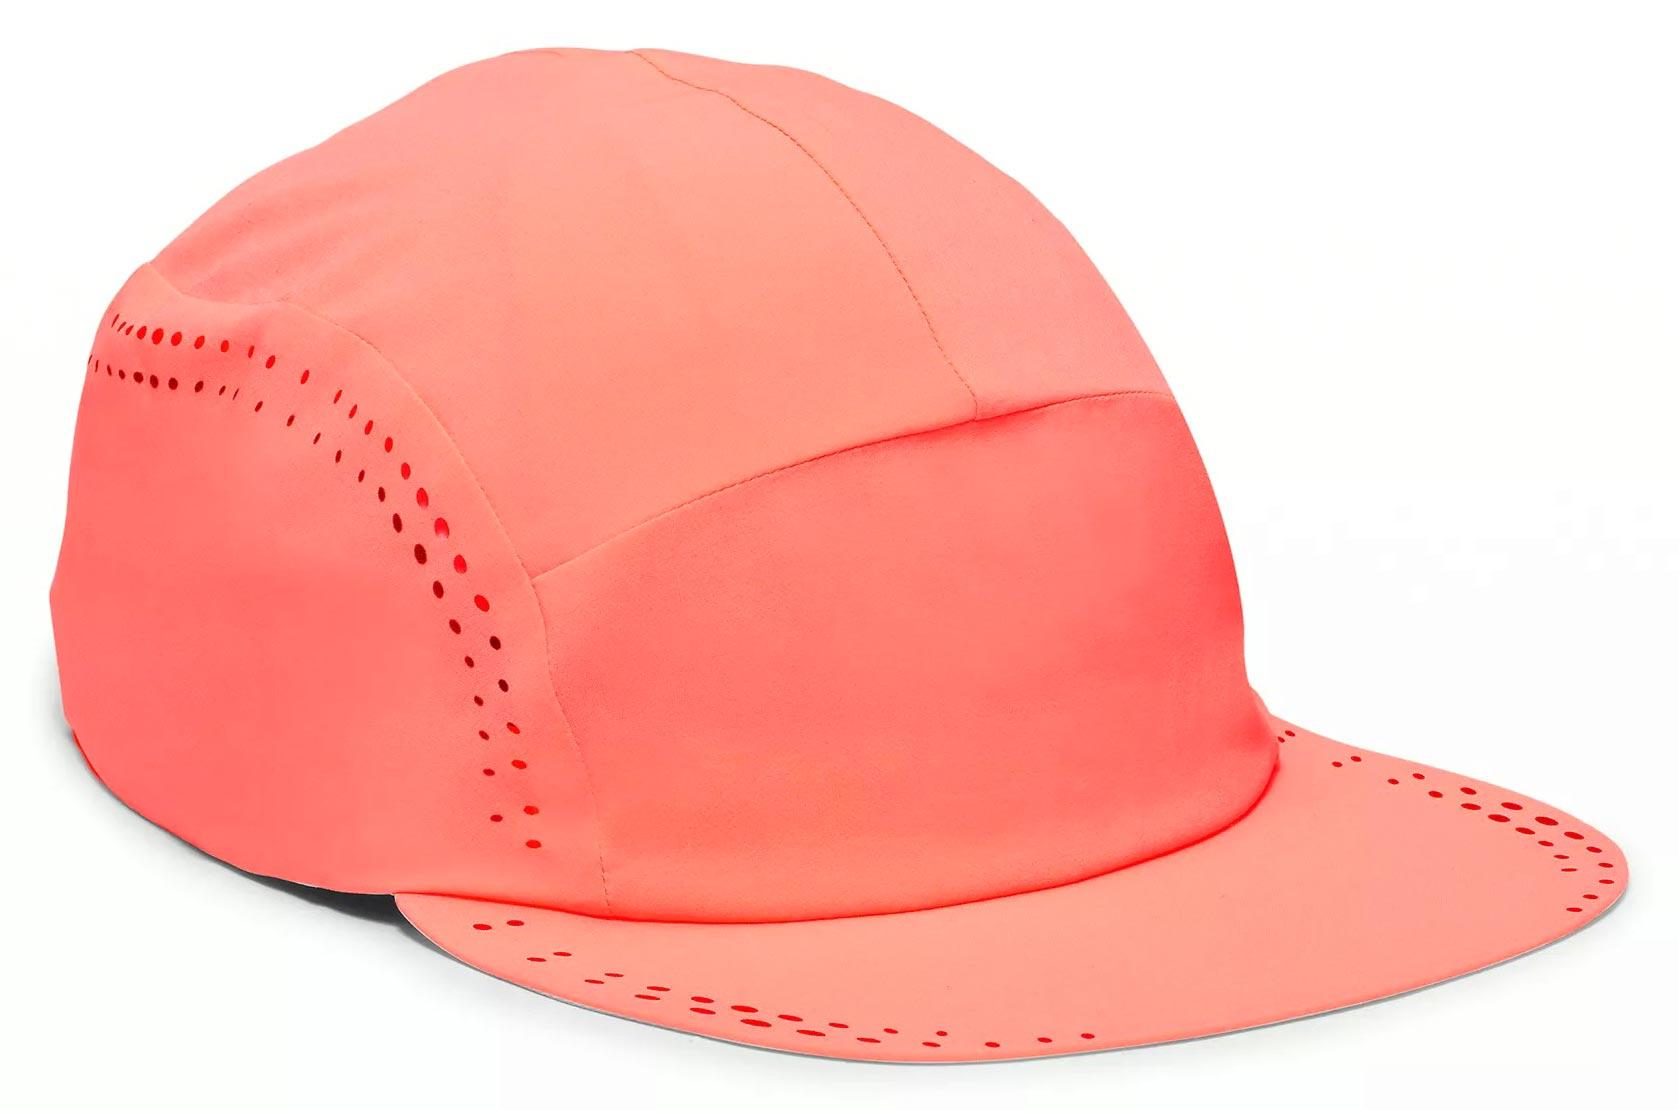 Lululemon Race Kit Hat Running Cap 5 Best Running Hats for Trail Running Trail and Kale